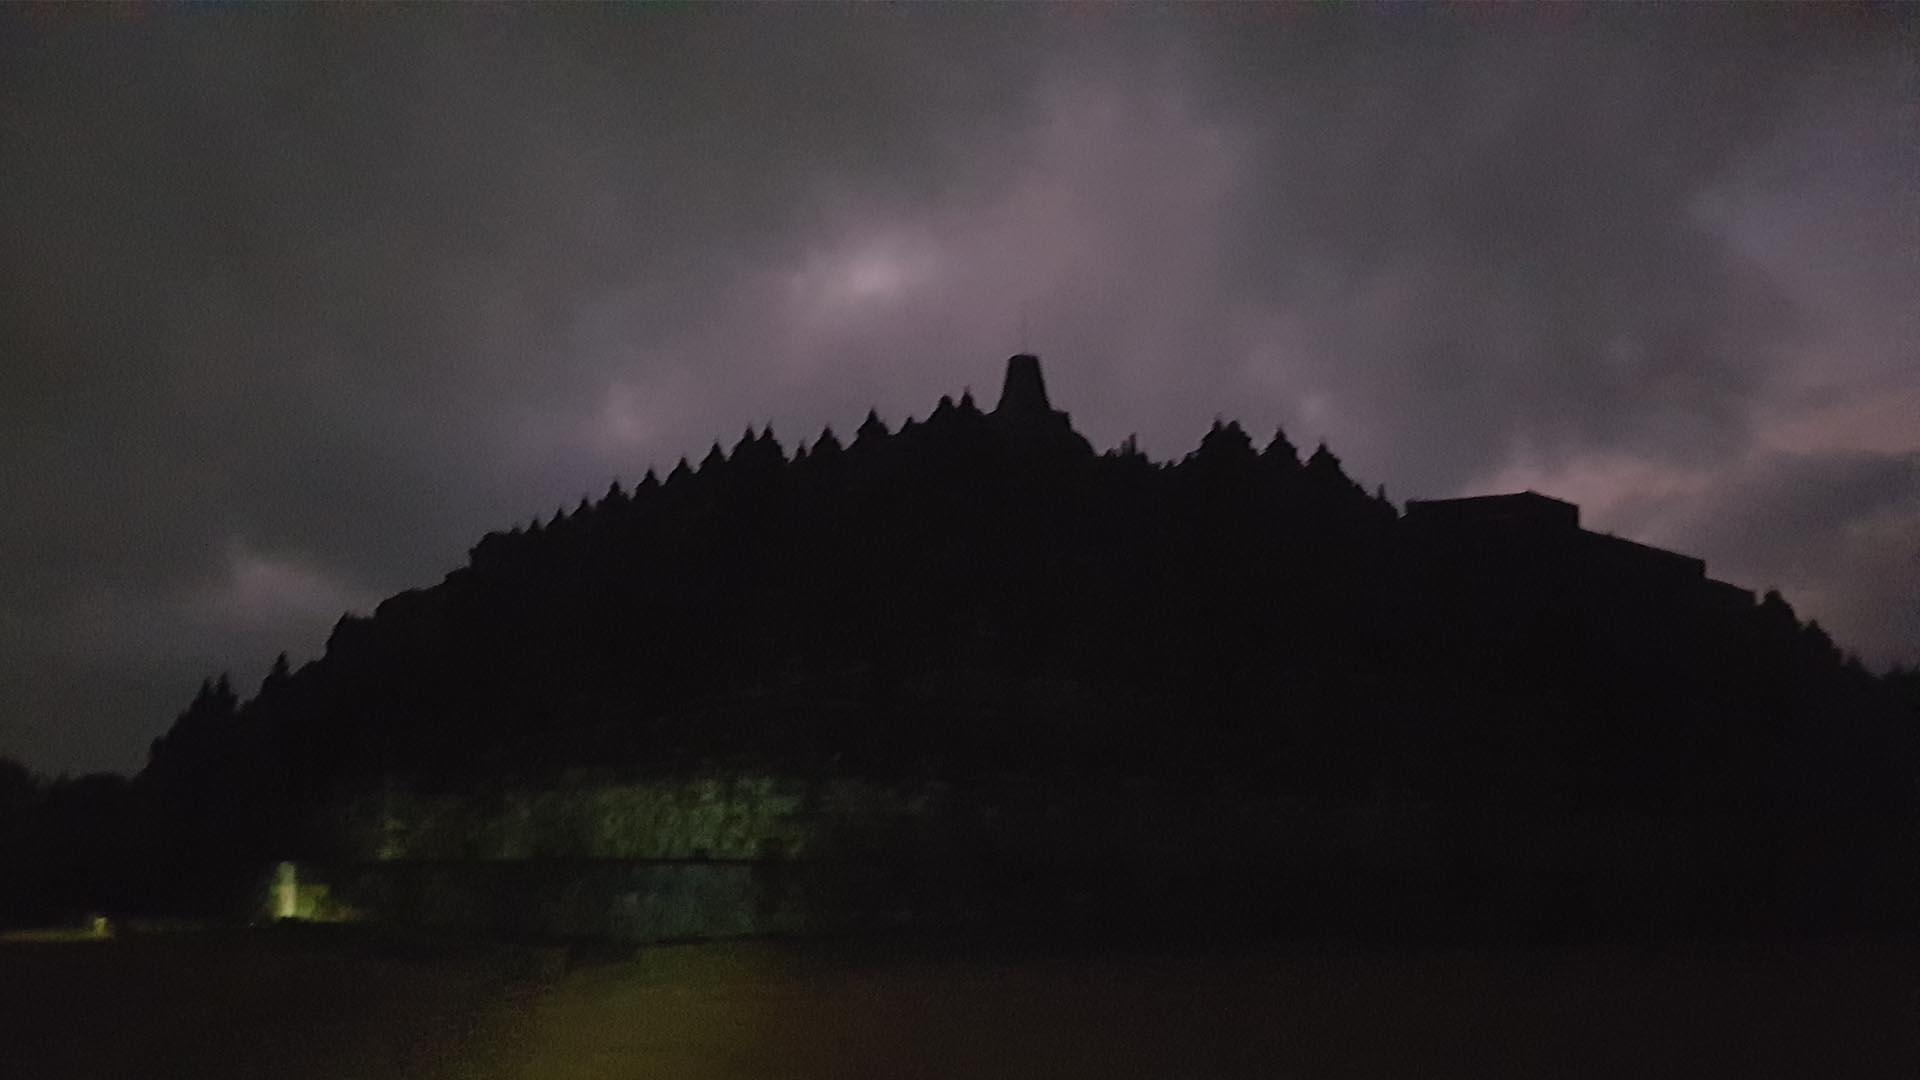 Silueta del Templo Borobudur en la oscuridad